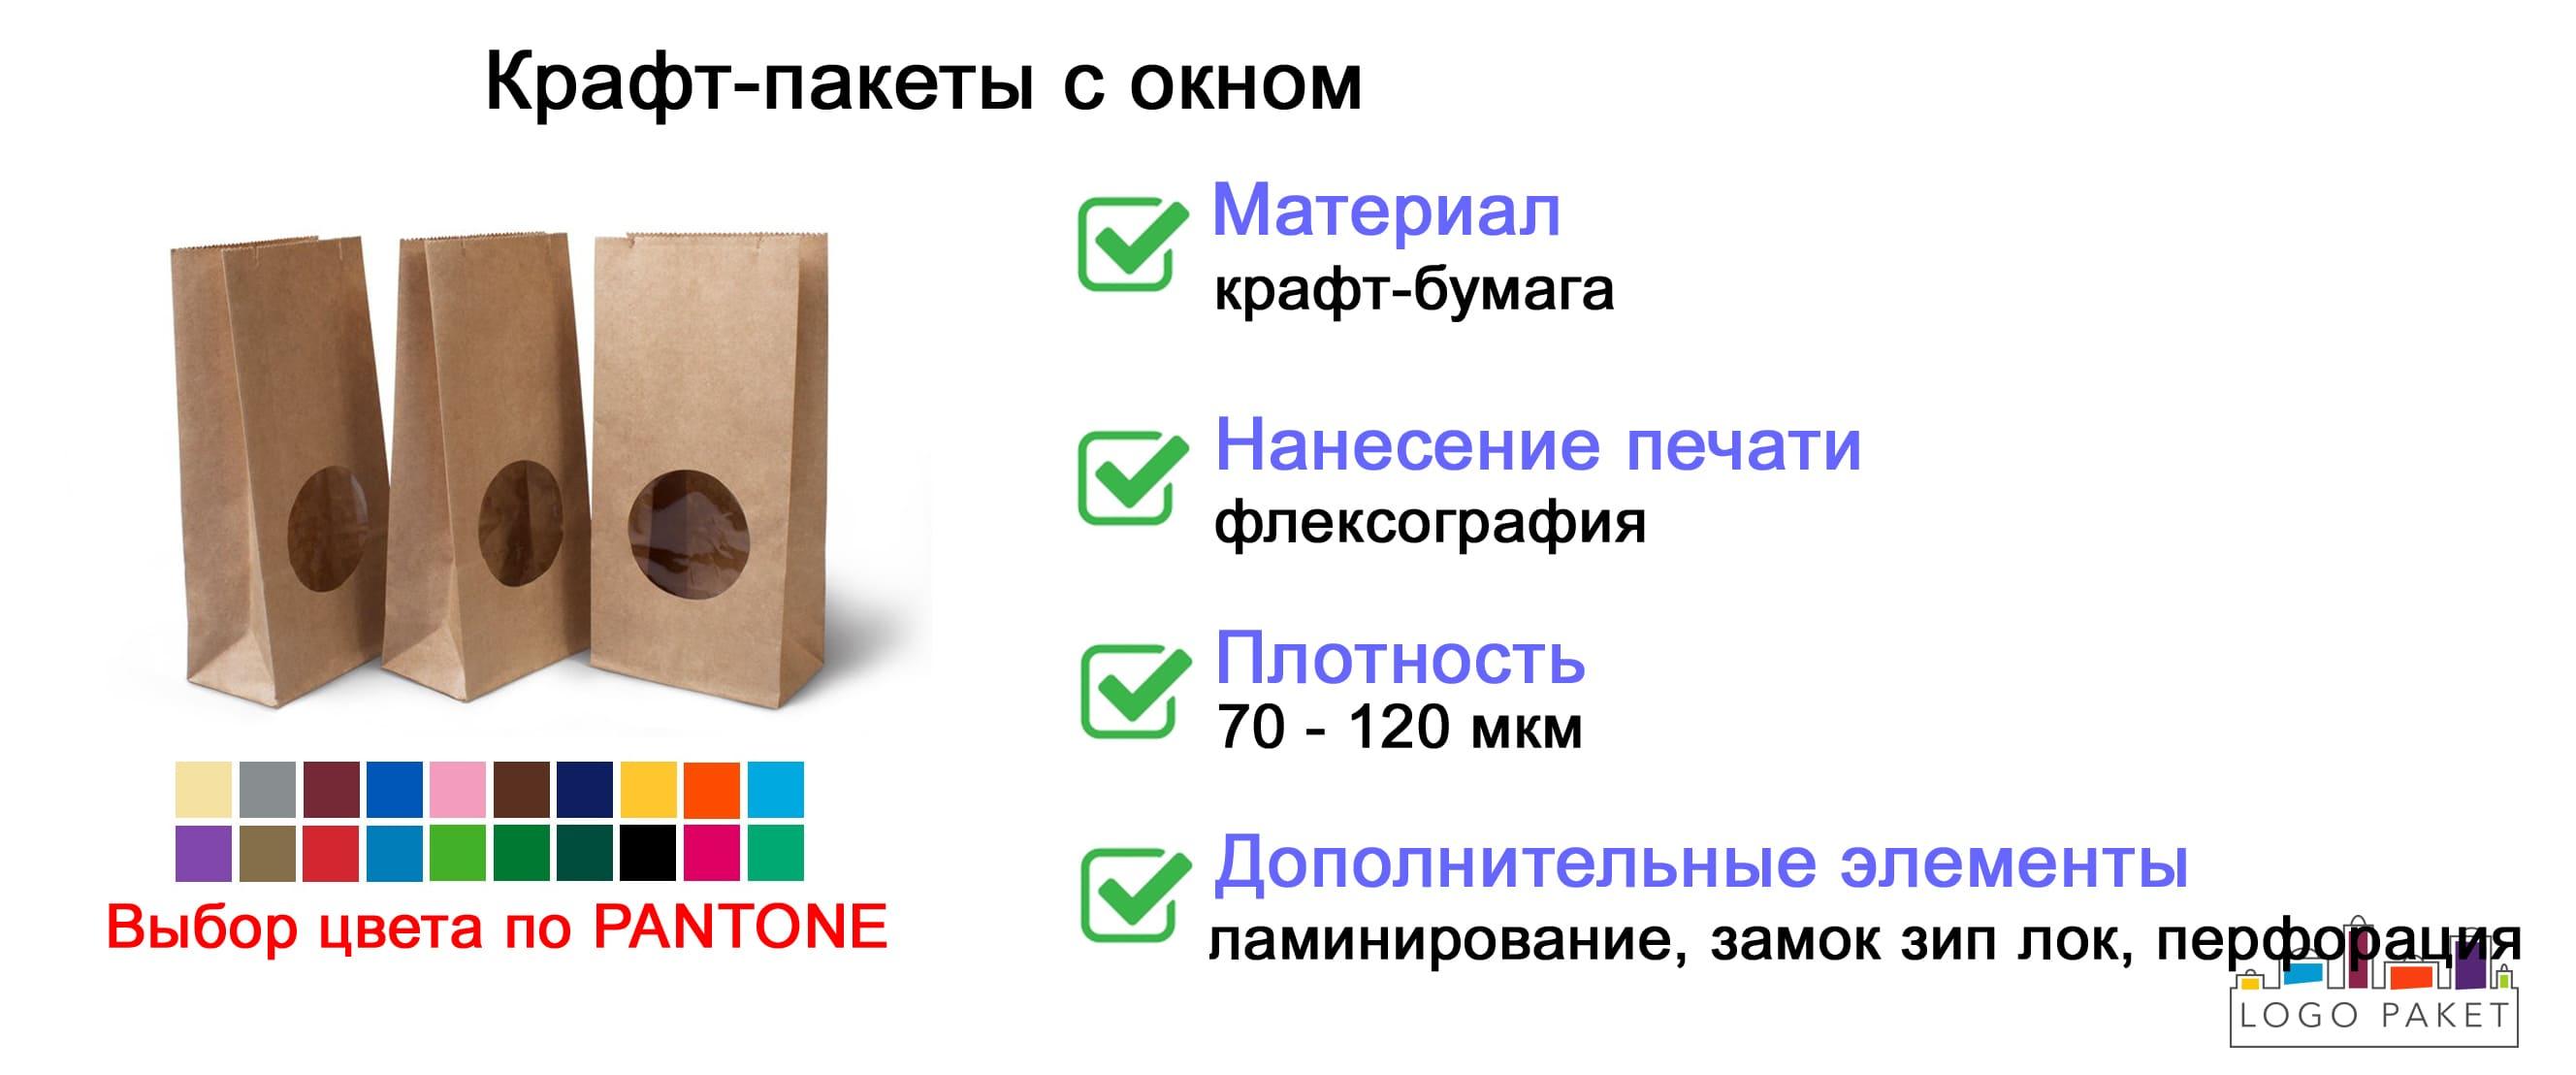 Крафт-пакеты с окном инфографика